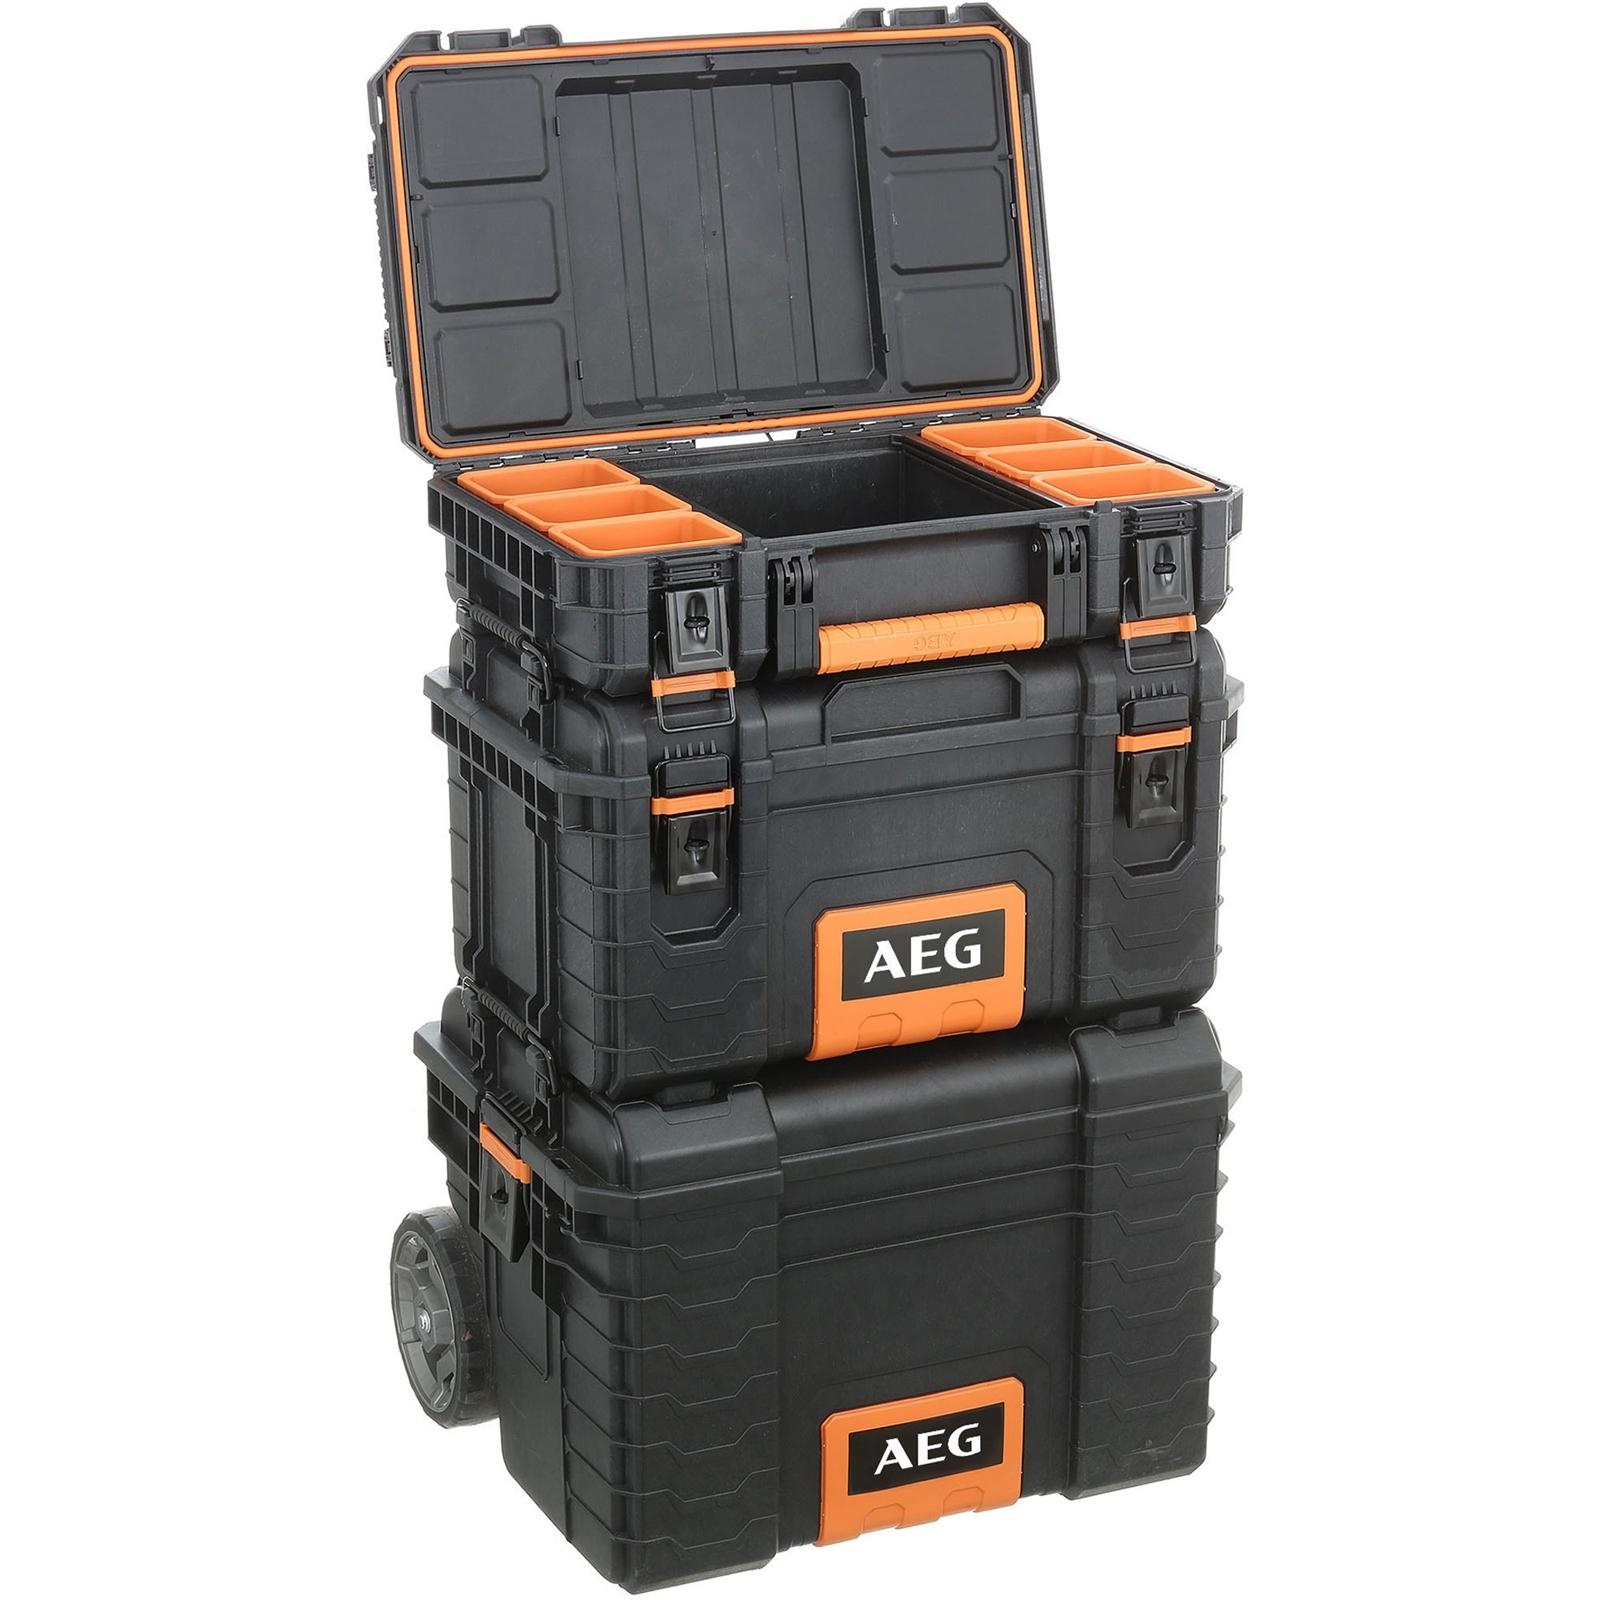 AEG 3 Piece Quickstack Modular Storage Kit